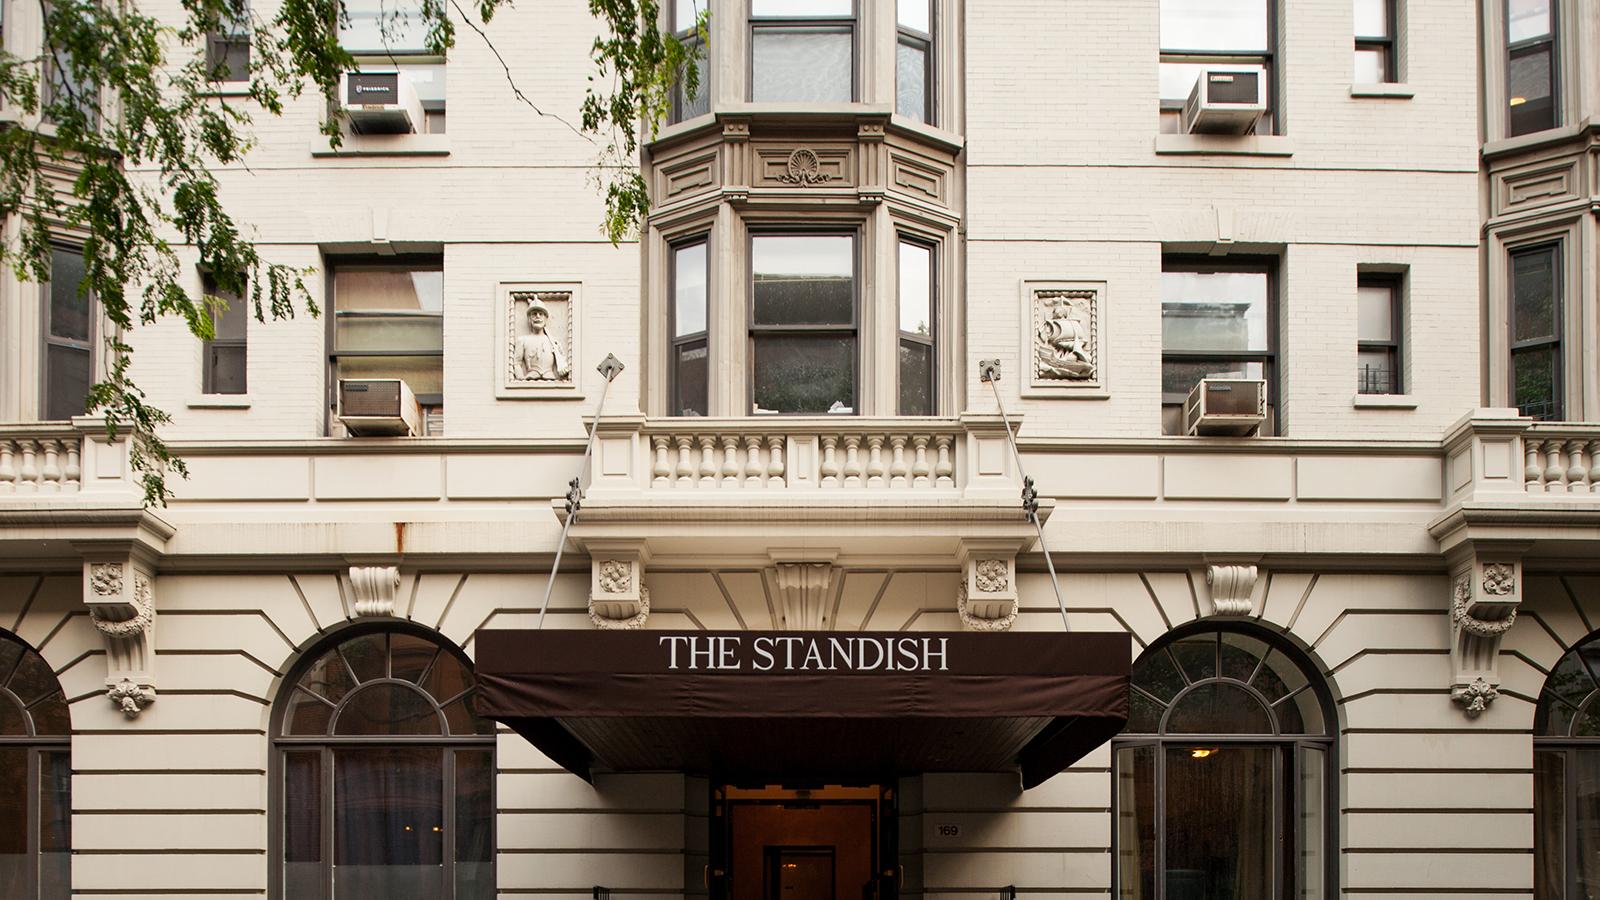 The Standish, 171 Columbia Heights